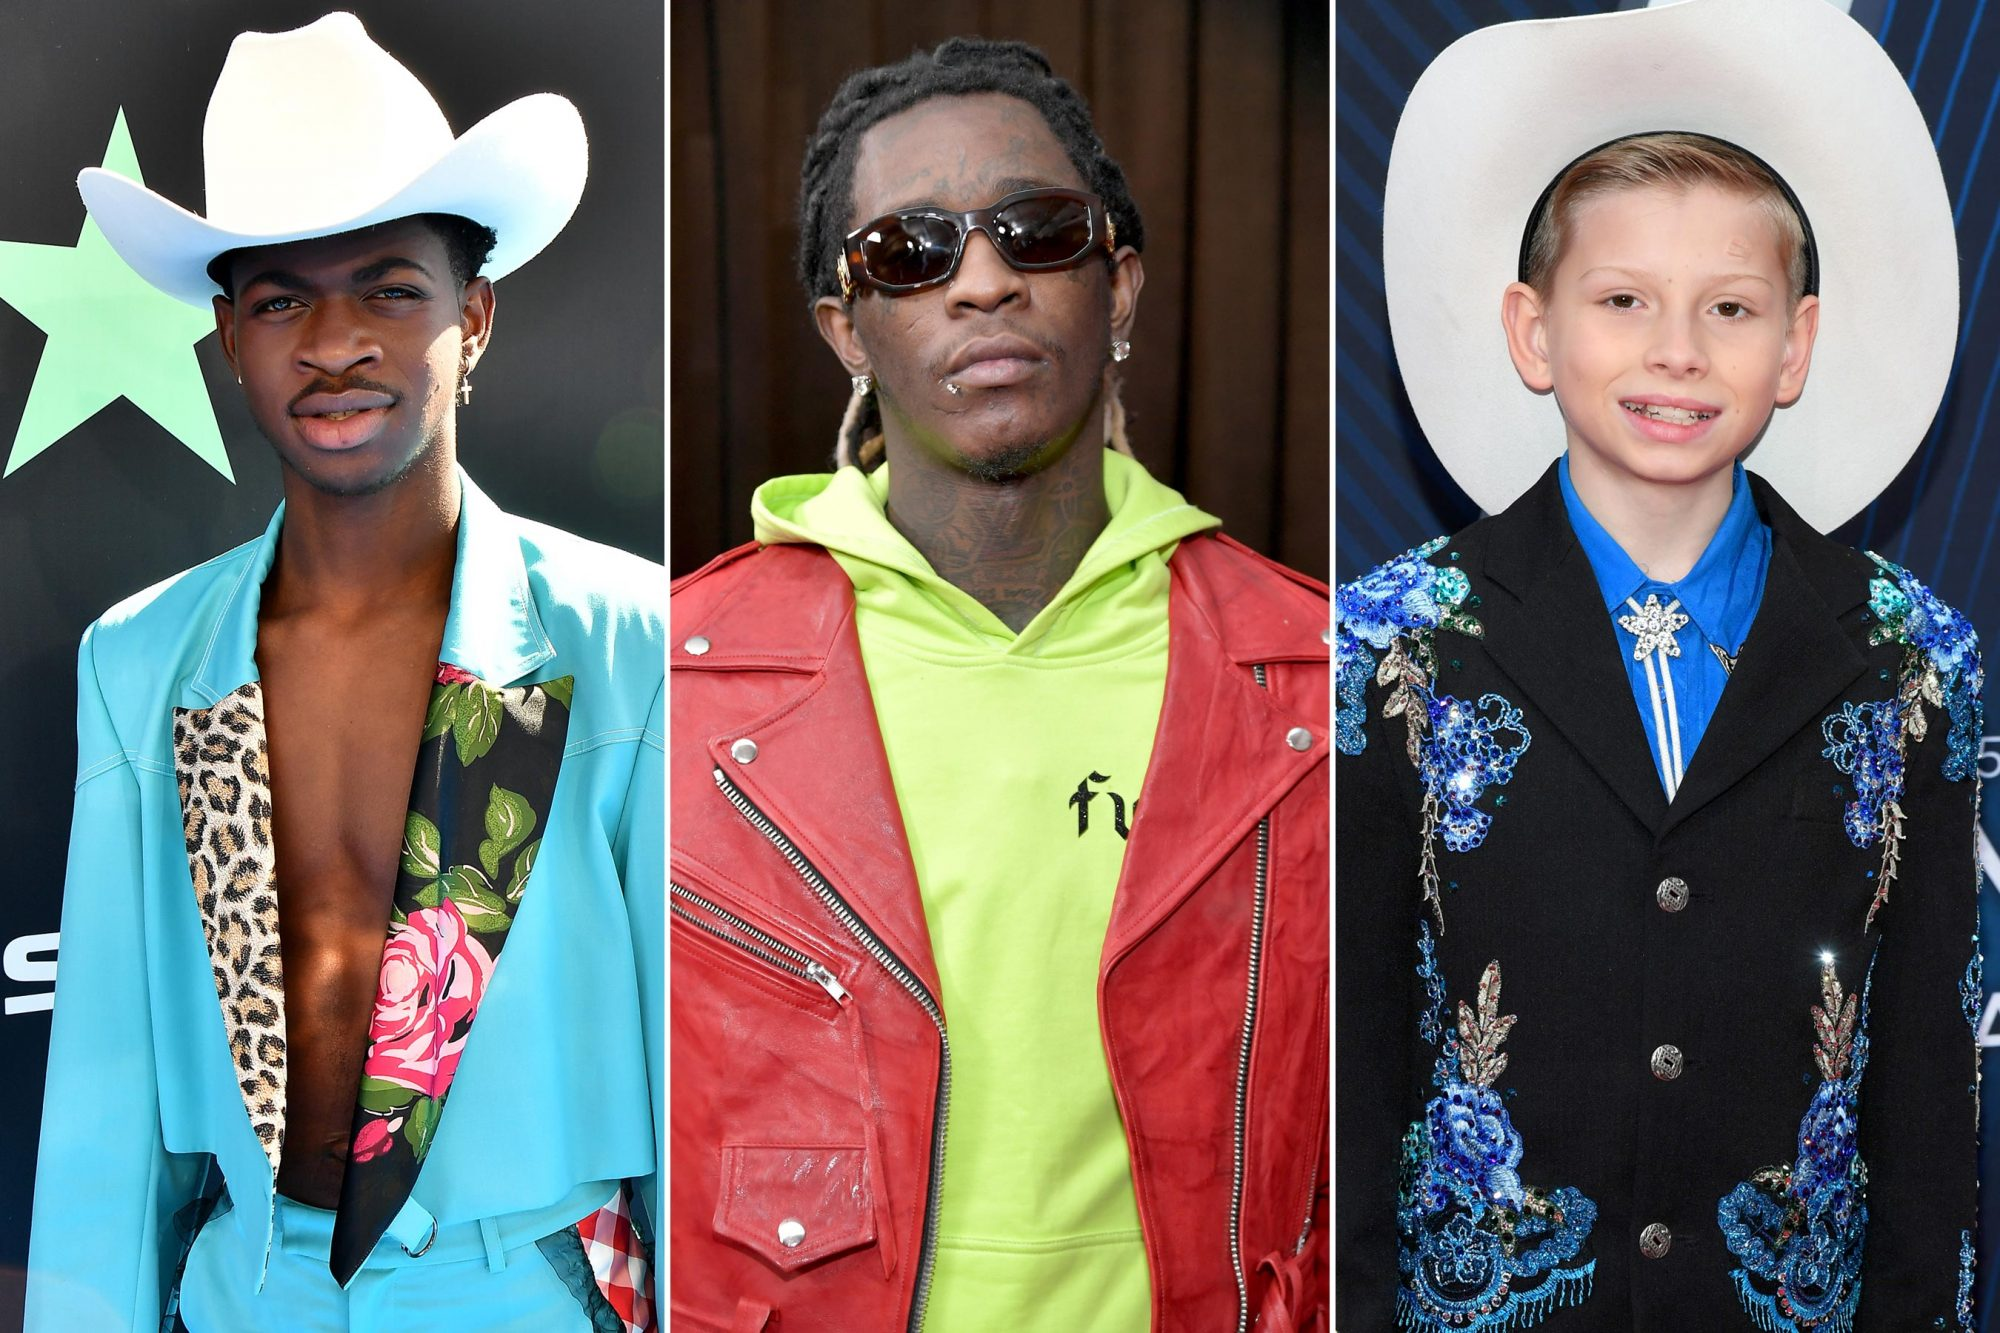 Lil Nas X; Young Thug; Mason Ramsey